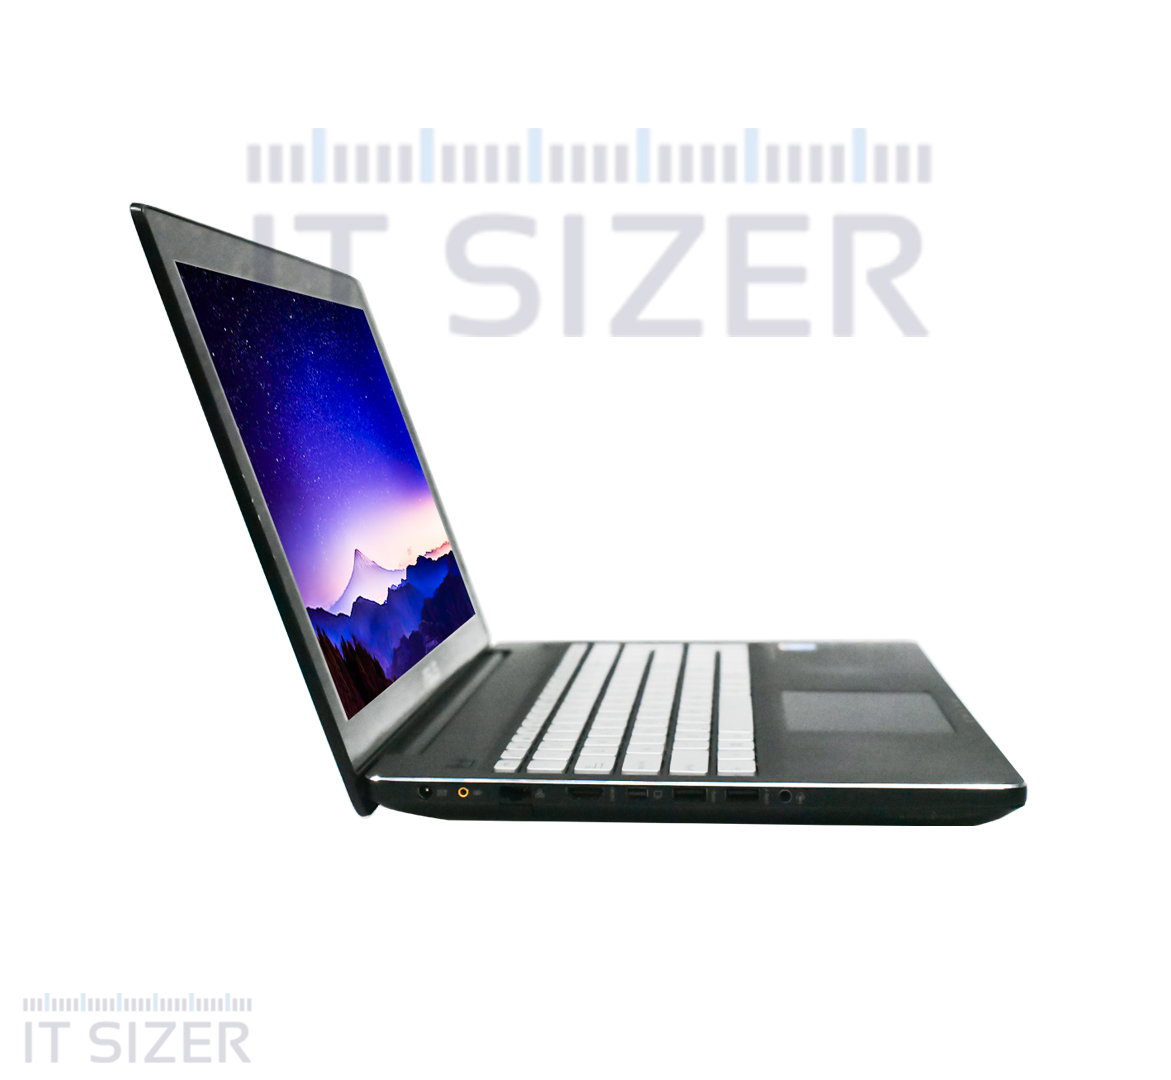 Asus Q550L Business Laptop, Intel Core i7 CPU, 8GB DDR3L SODIMM RAM, 256GB SSD 2.5, 15 inch Touch Display, Windows 10 Pro (Renewed)